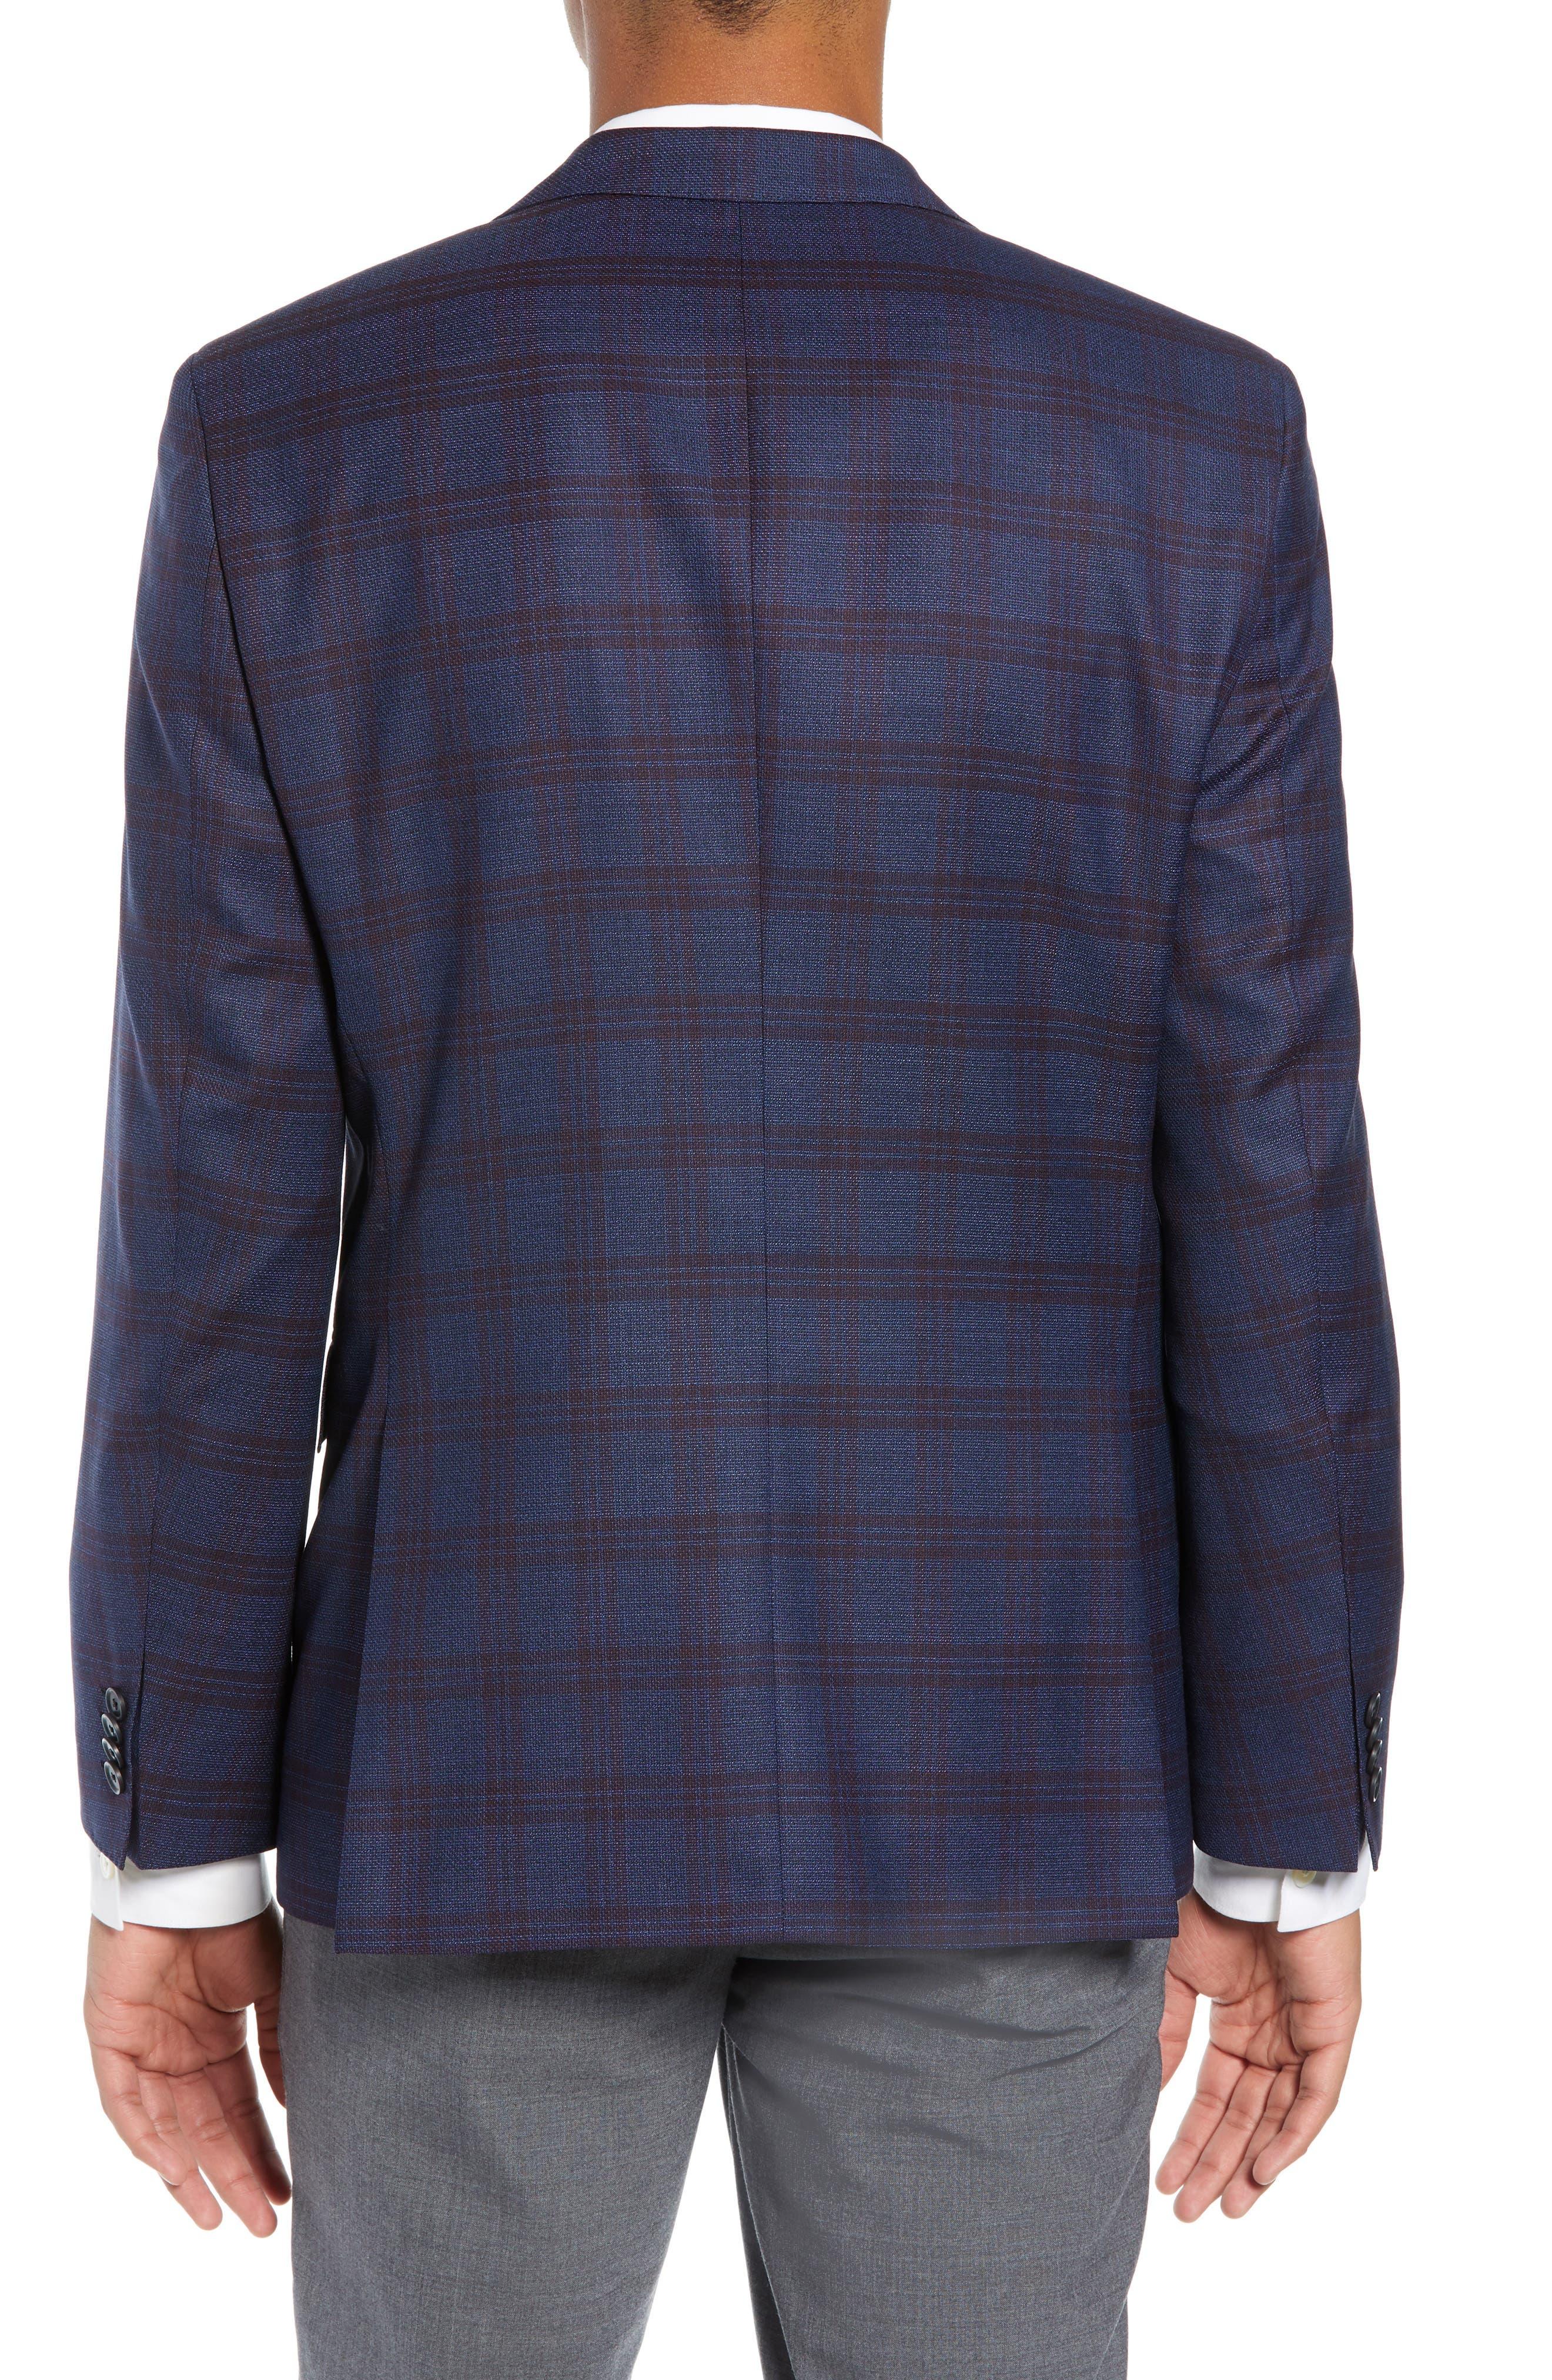 Jewels Classic Fit Plaid Wool Sport Coat,                             Alternate thumbnail 2, color,                             OPEN BLUE